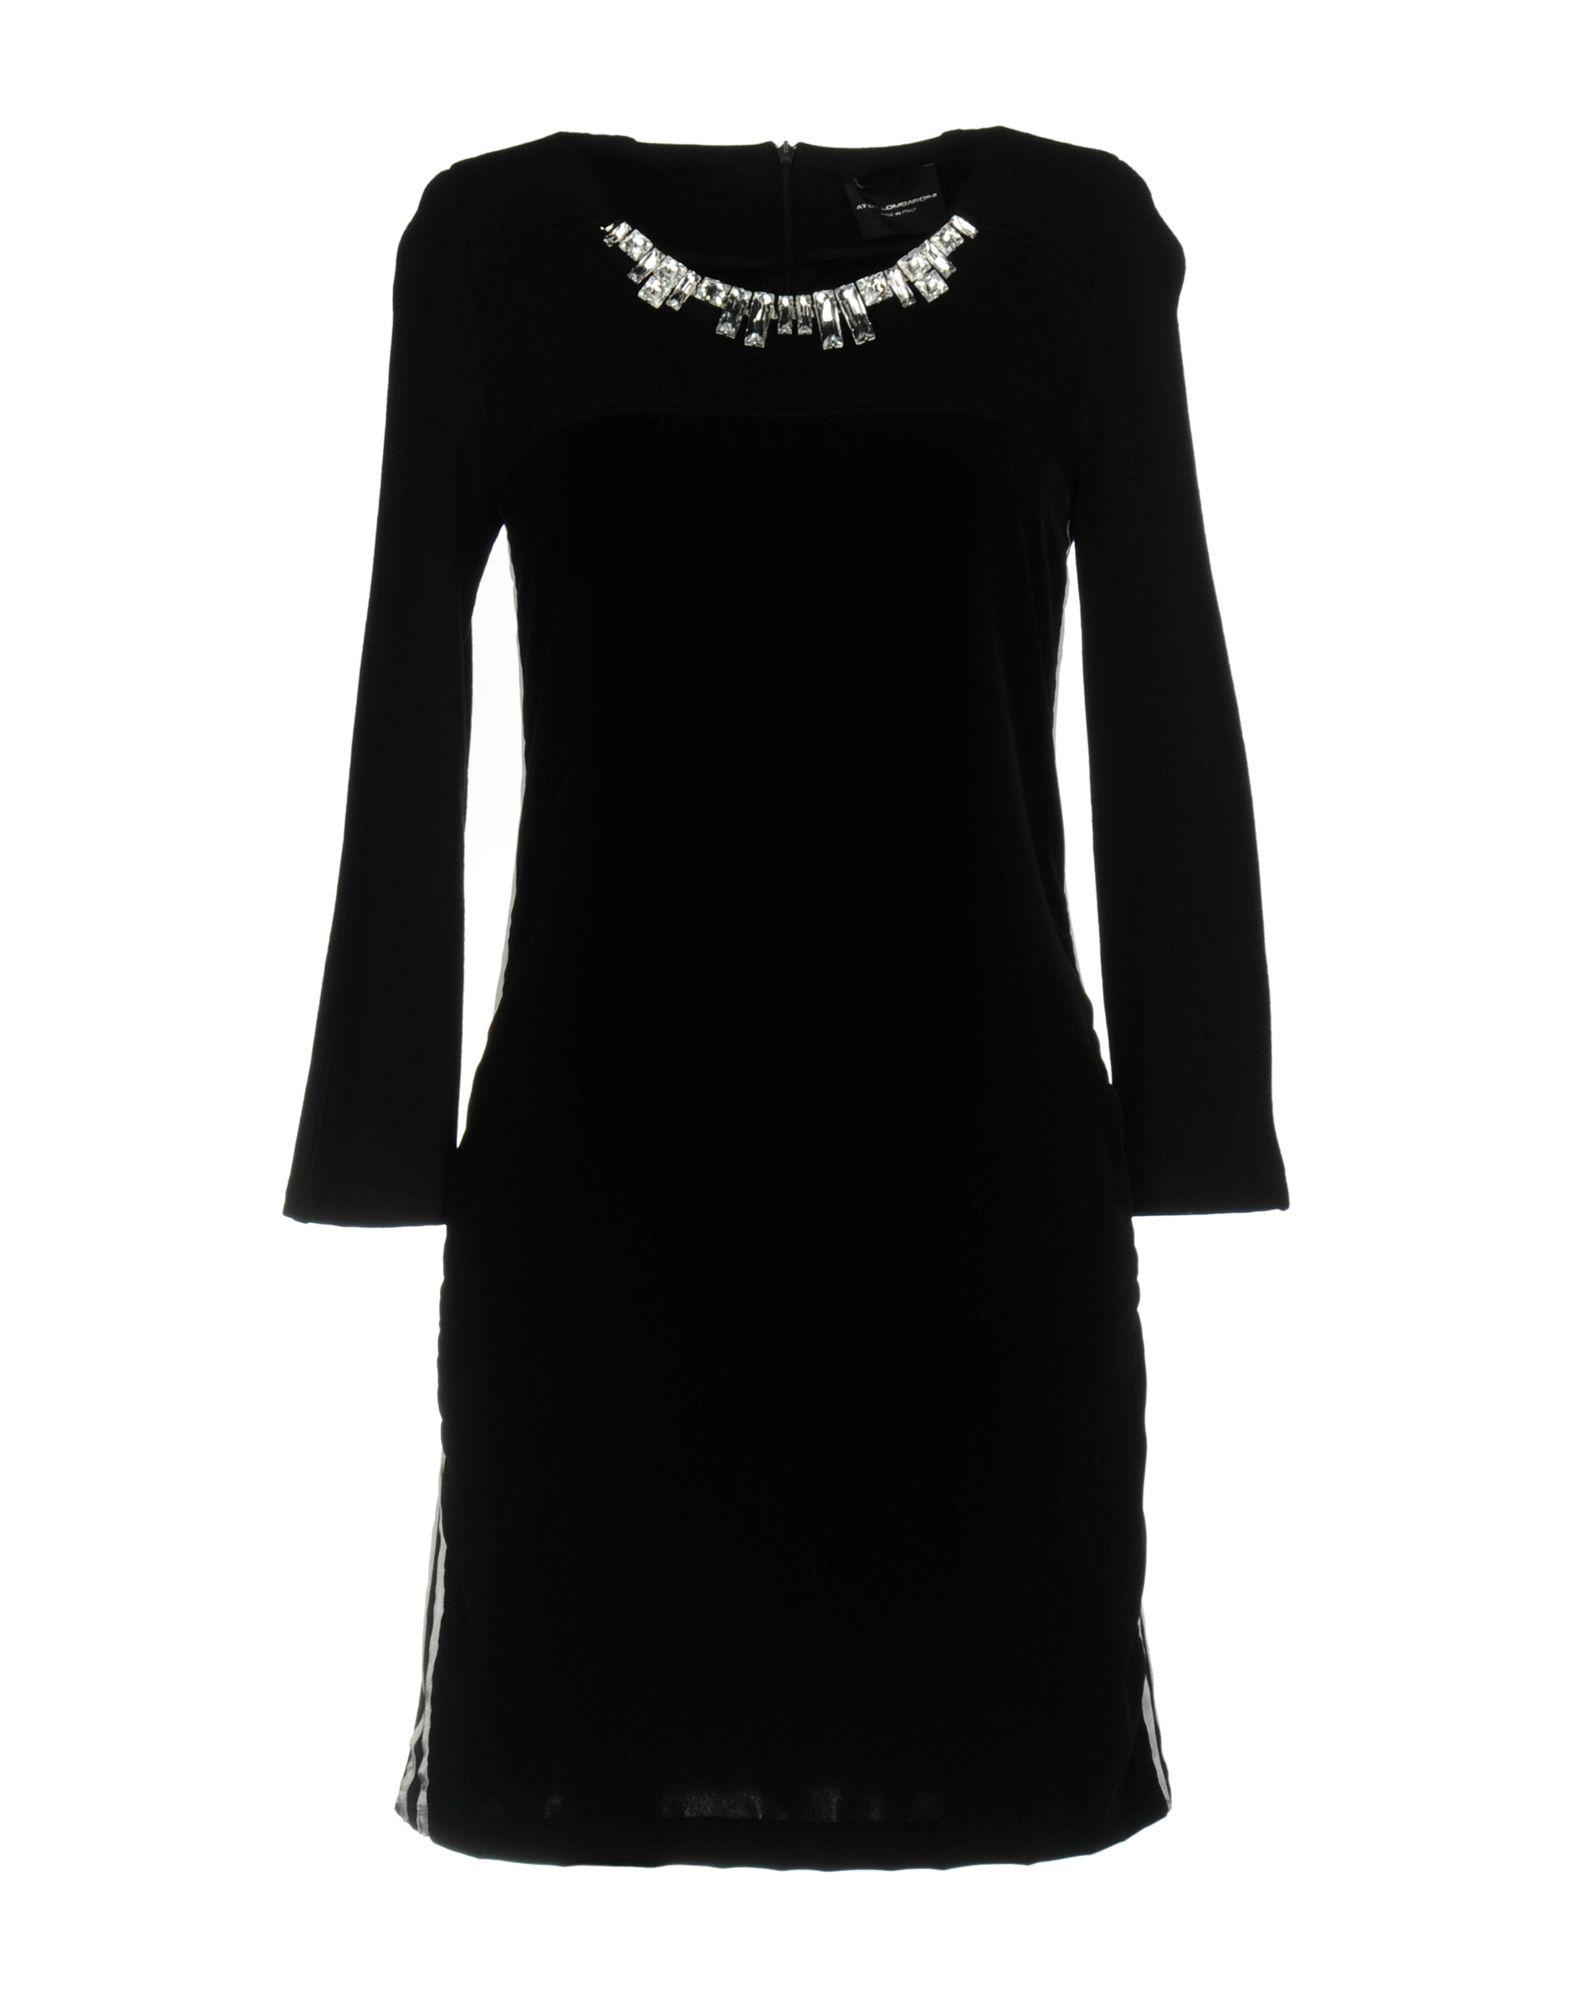 ATOS LOMBARDINI Short Dress in Black